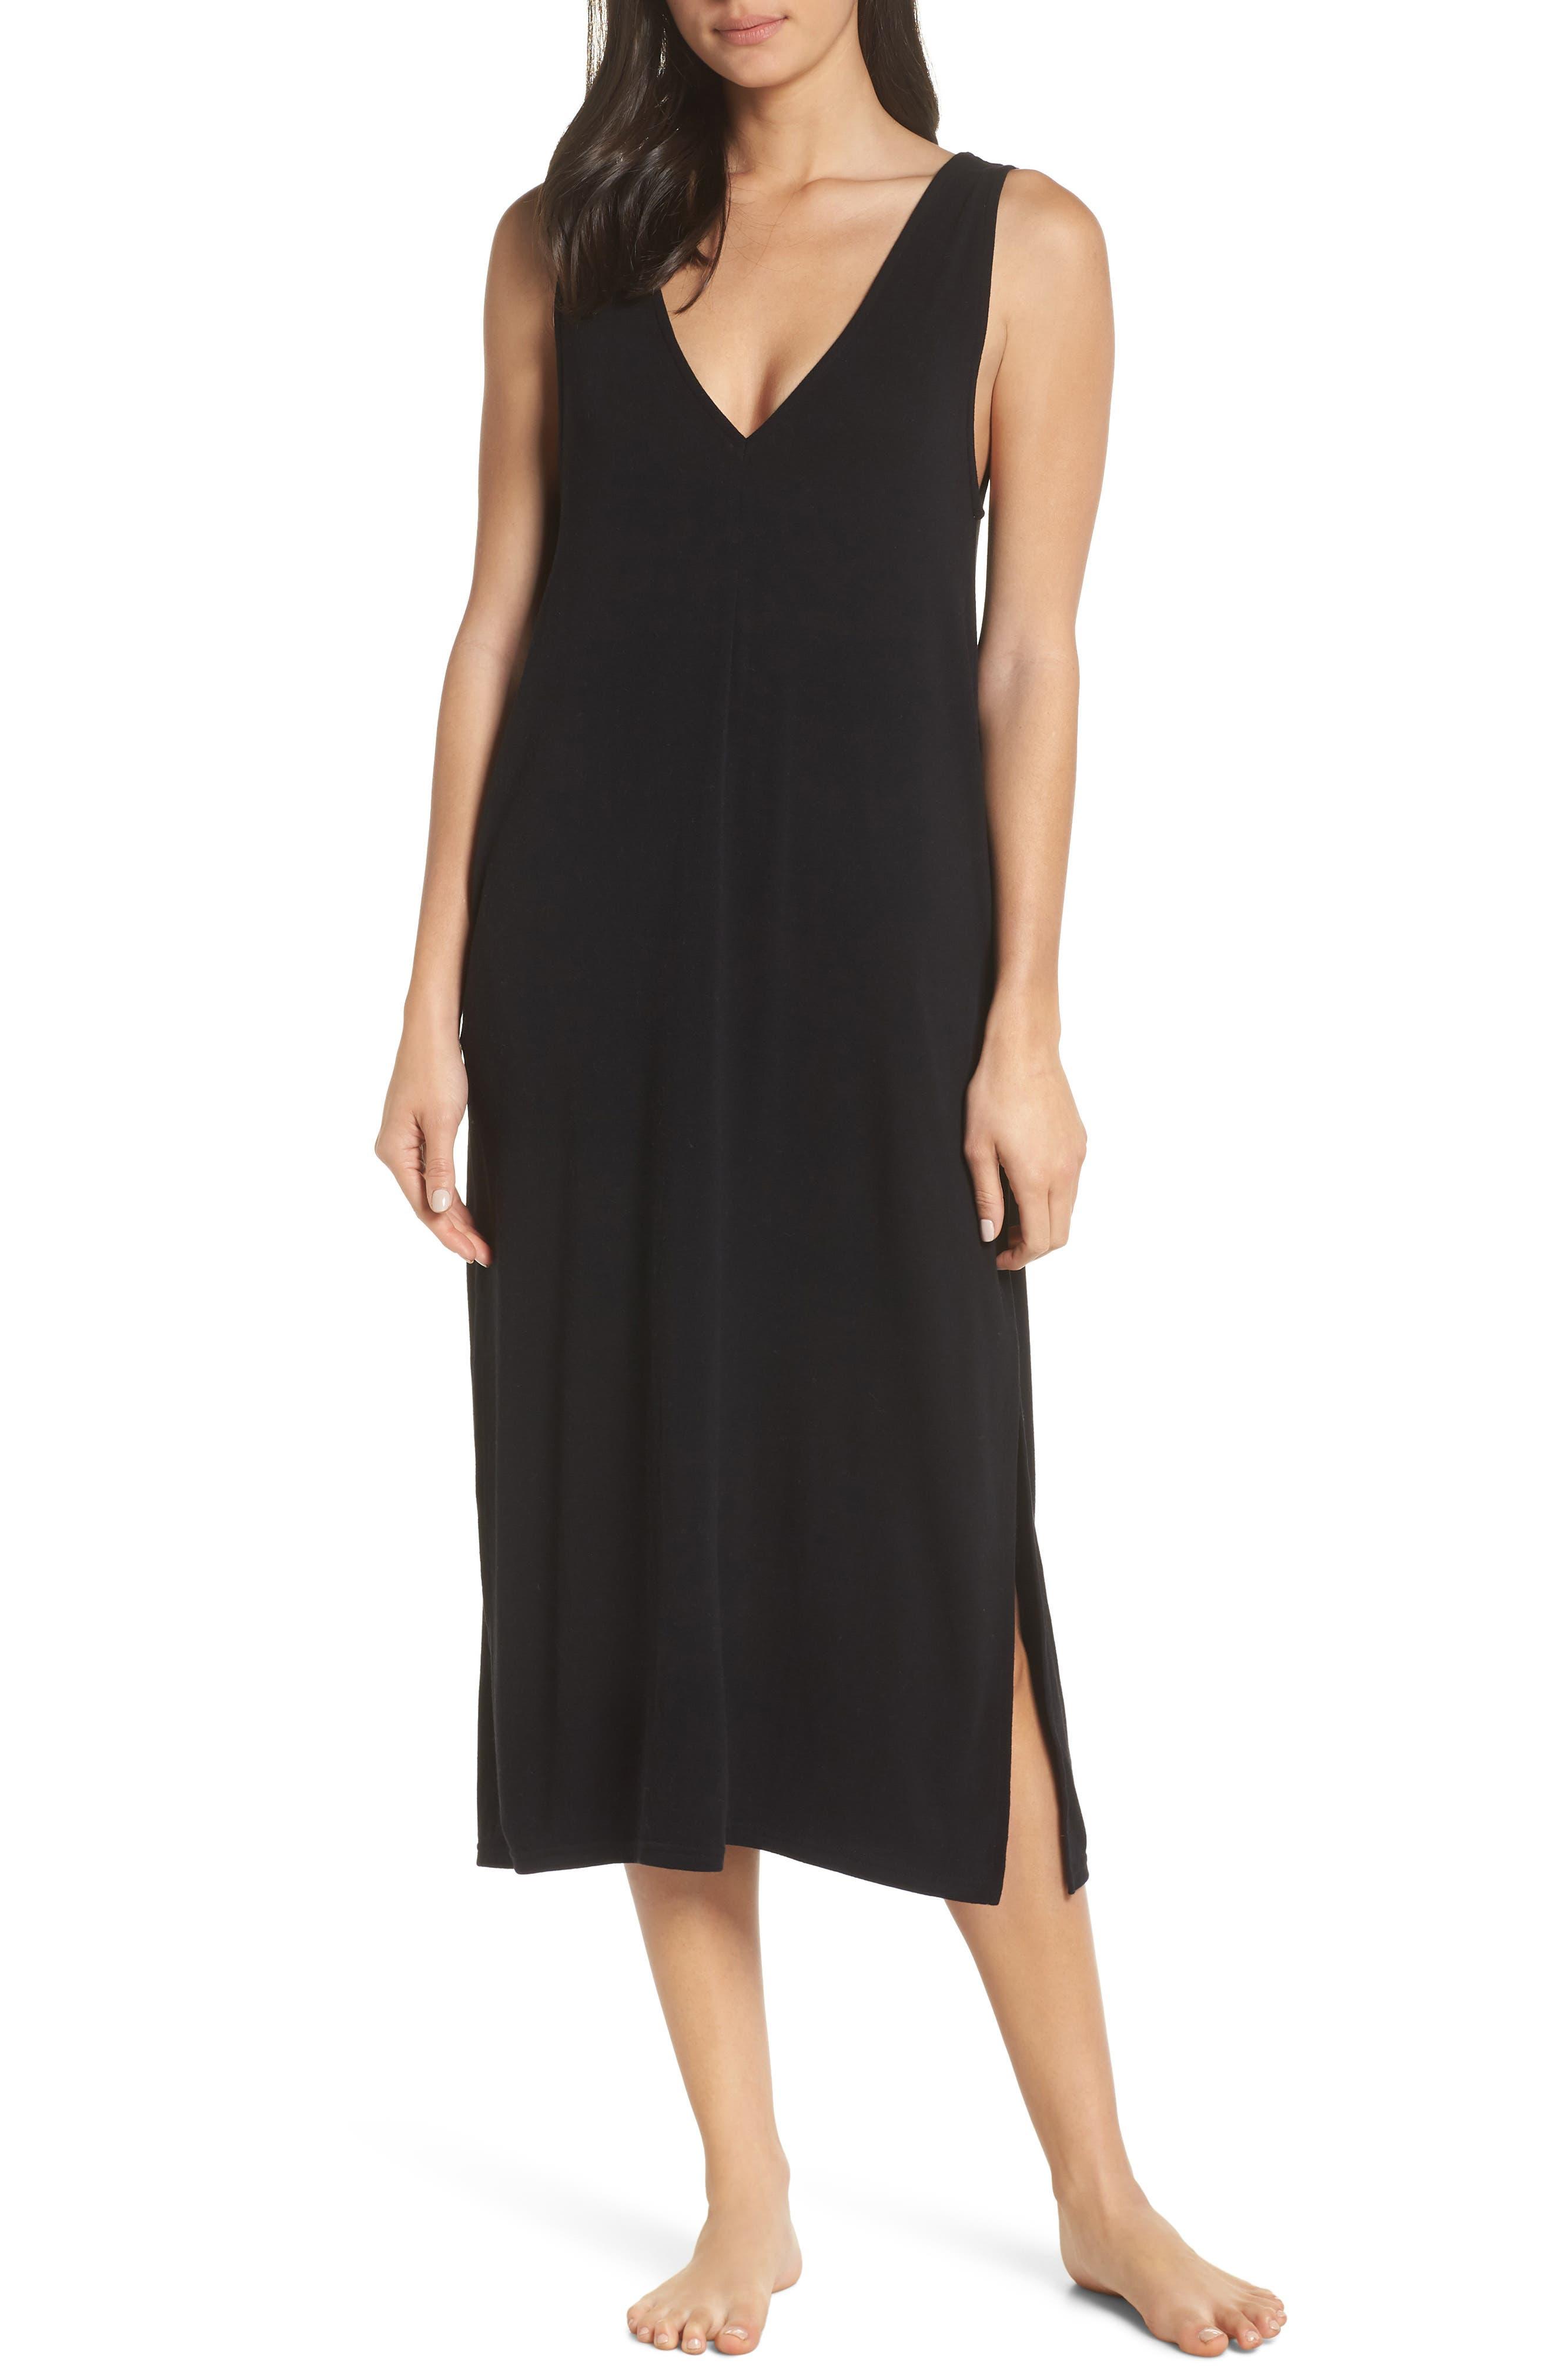 SOMETHING NAVY, Midi Nightgown, Main thumbnail 1, color, BLACK